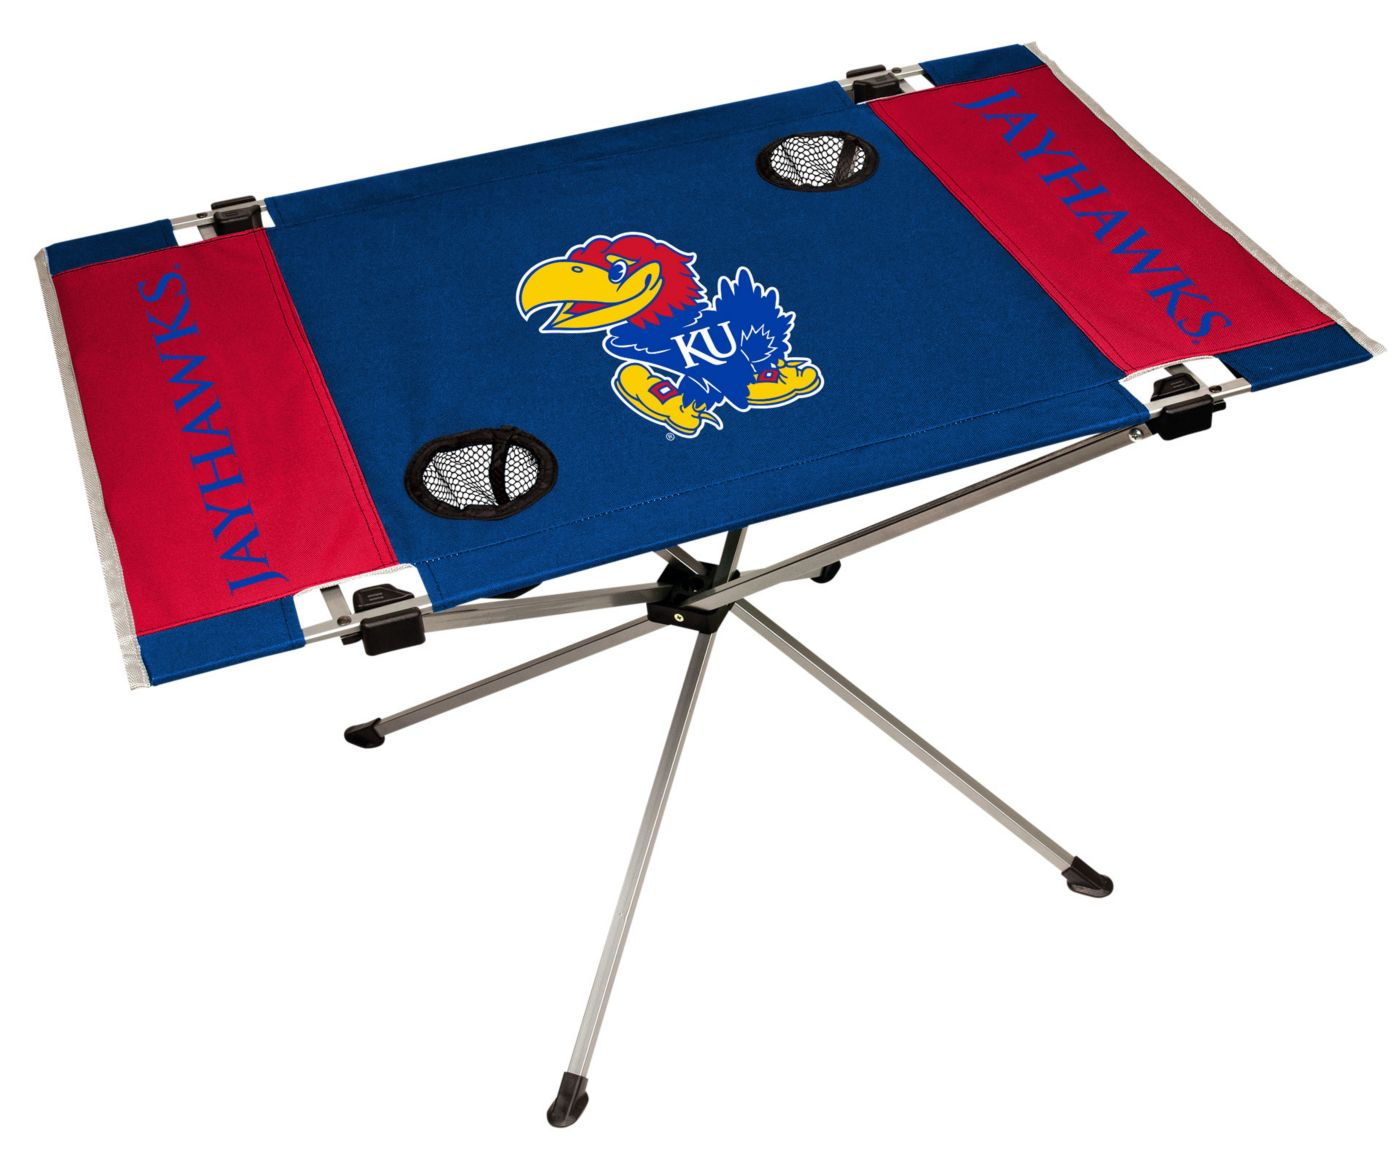 Rawlings Kansas Jayhawks Endzone Table